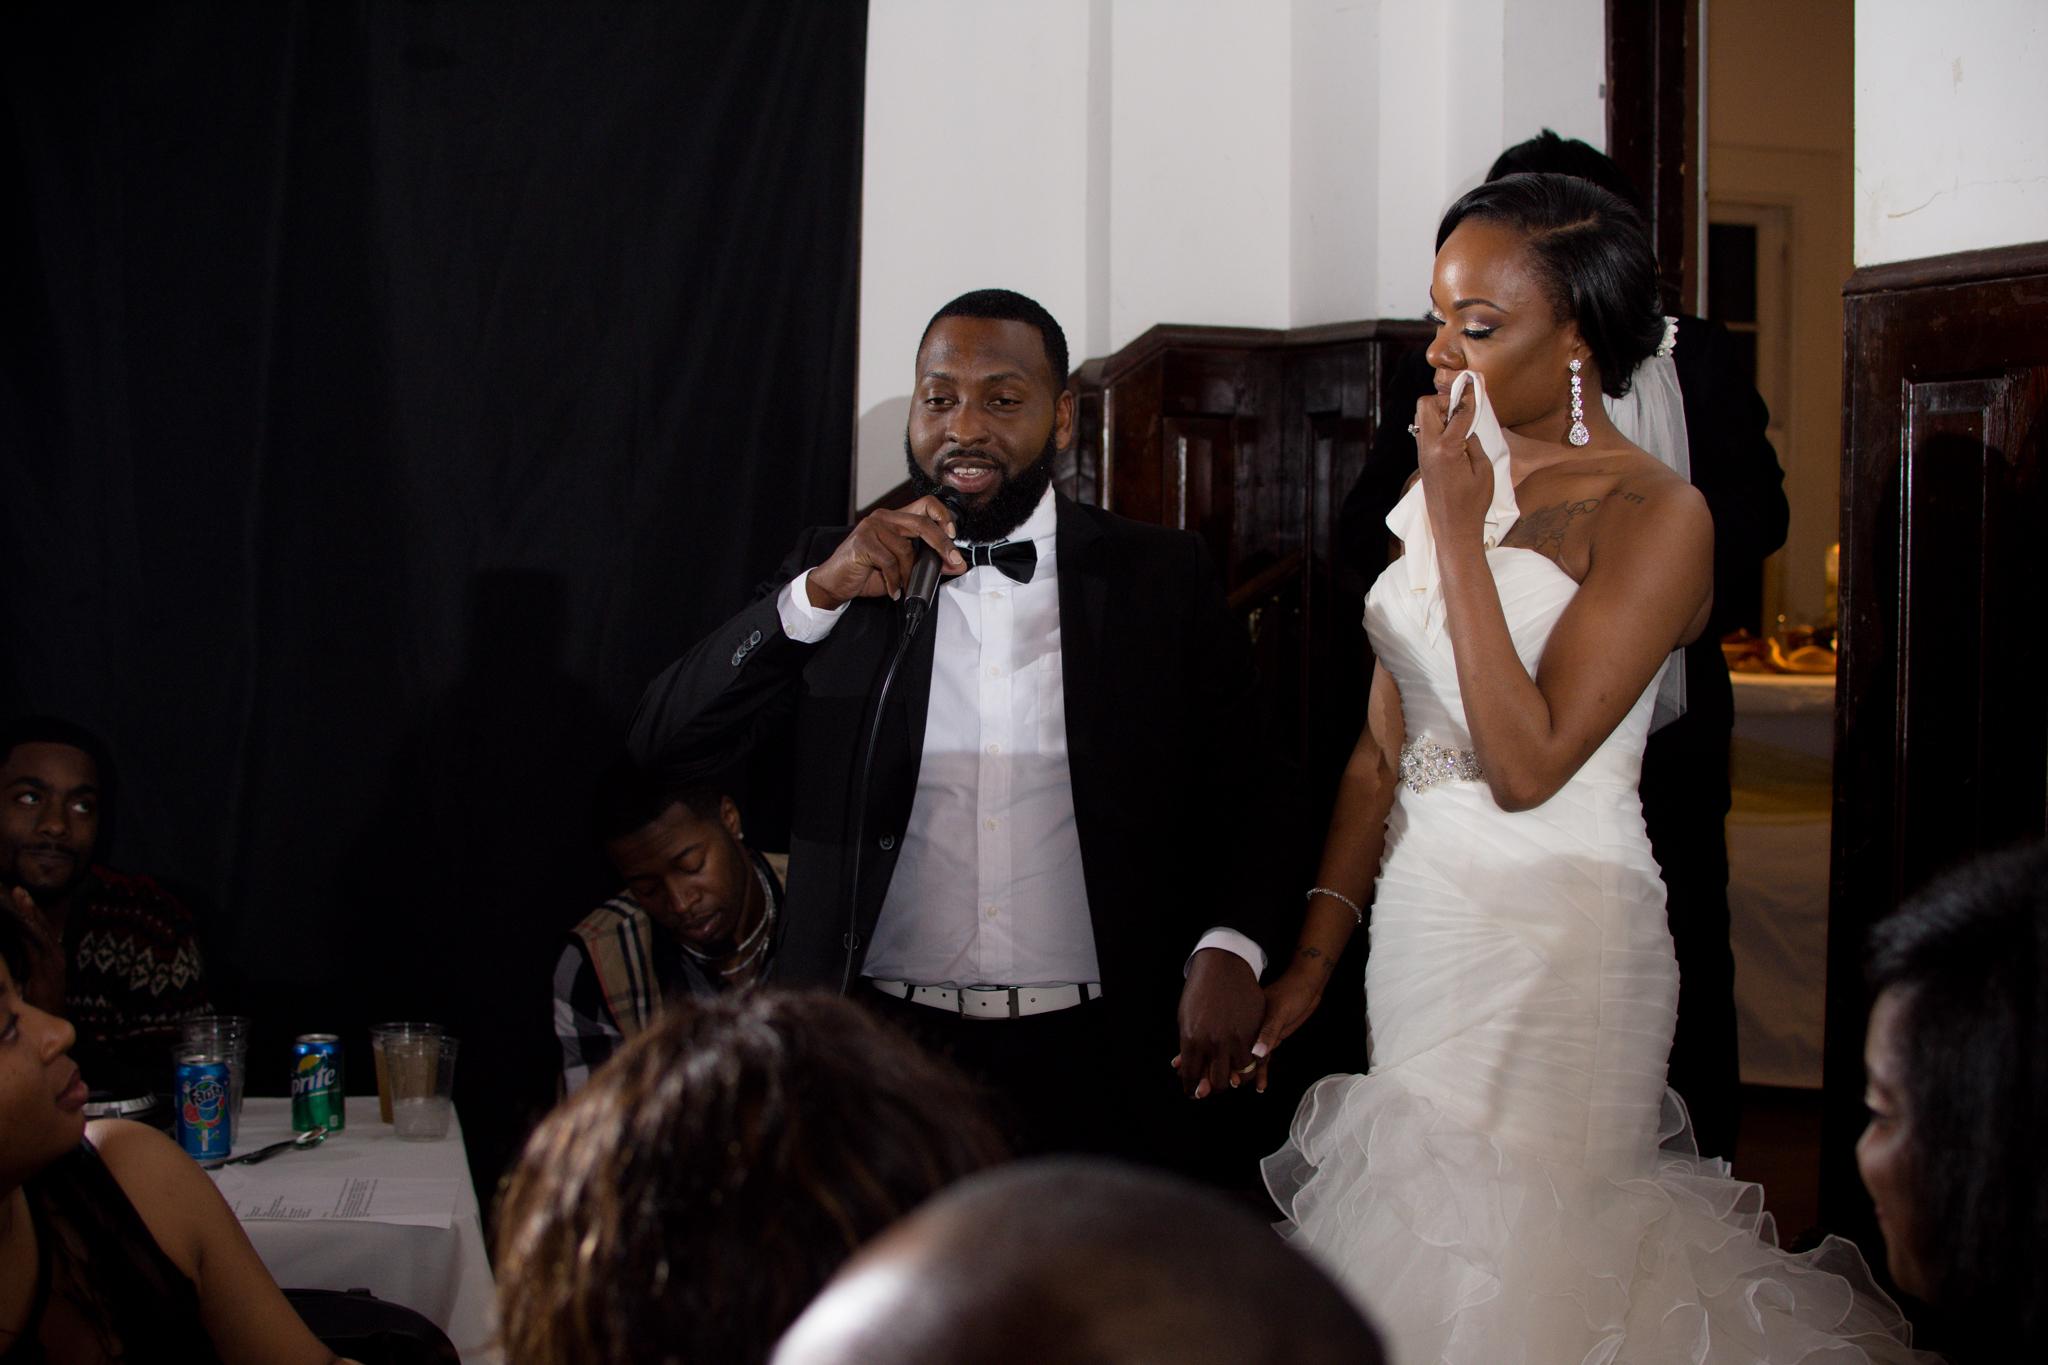 chaplin wedding (163 of 181).JPG